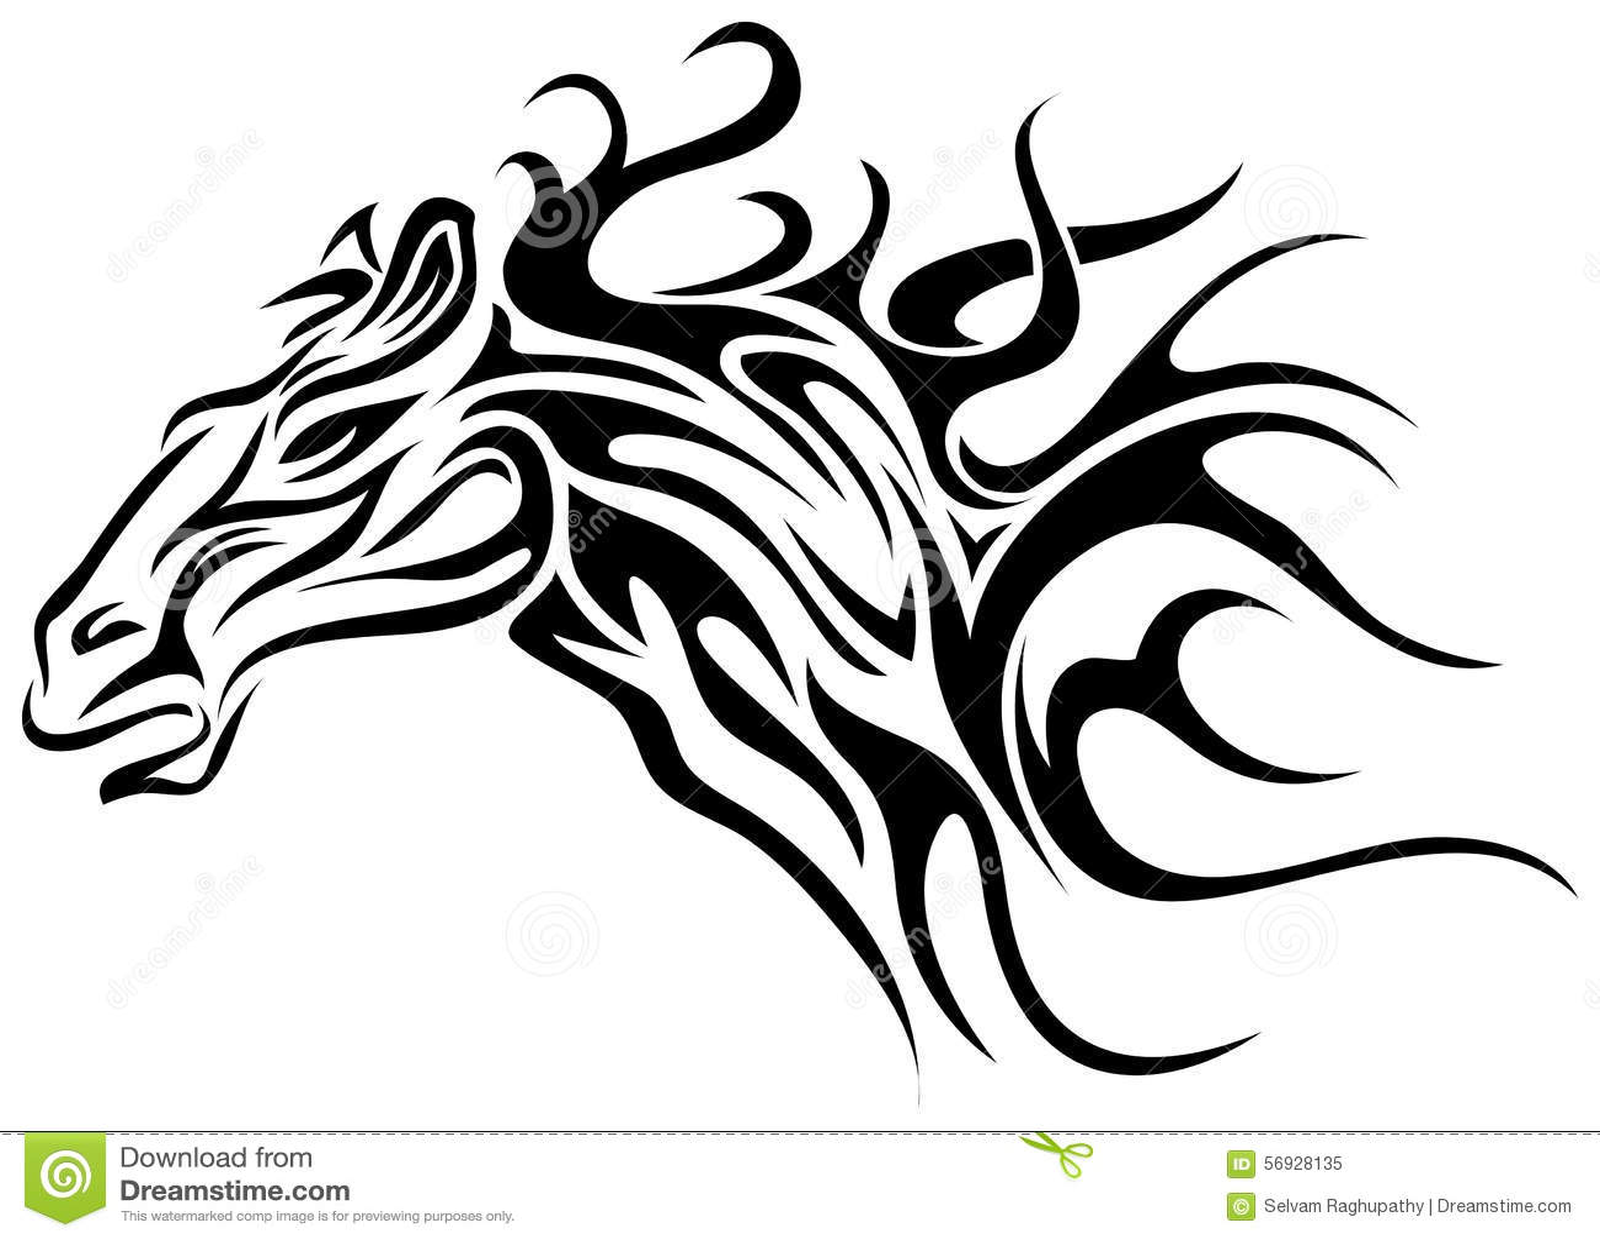 Horse Tattoo Stock Vector